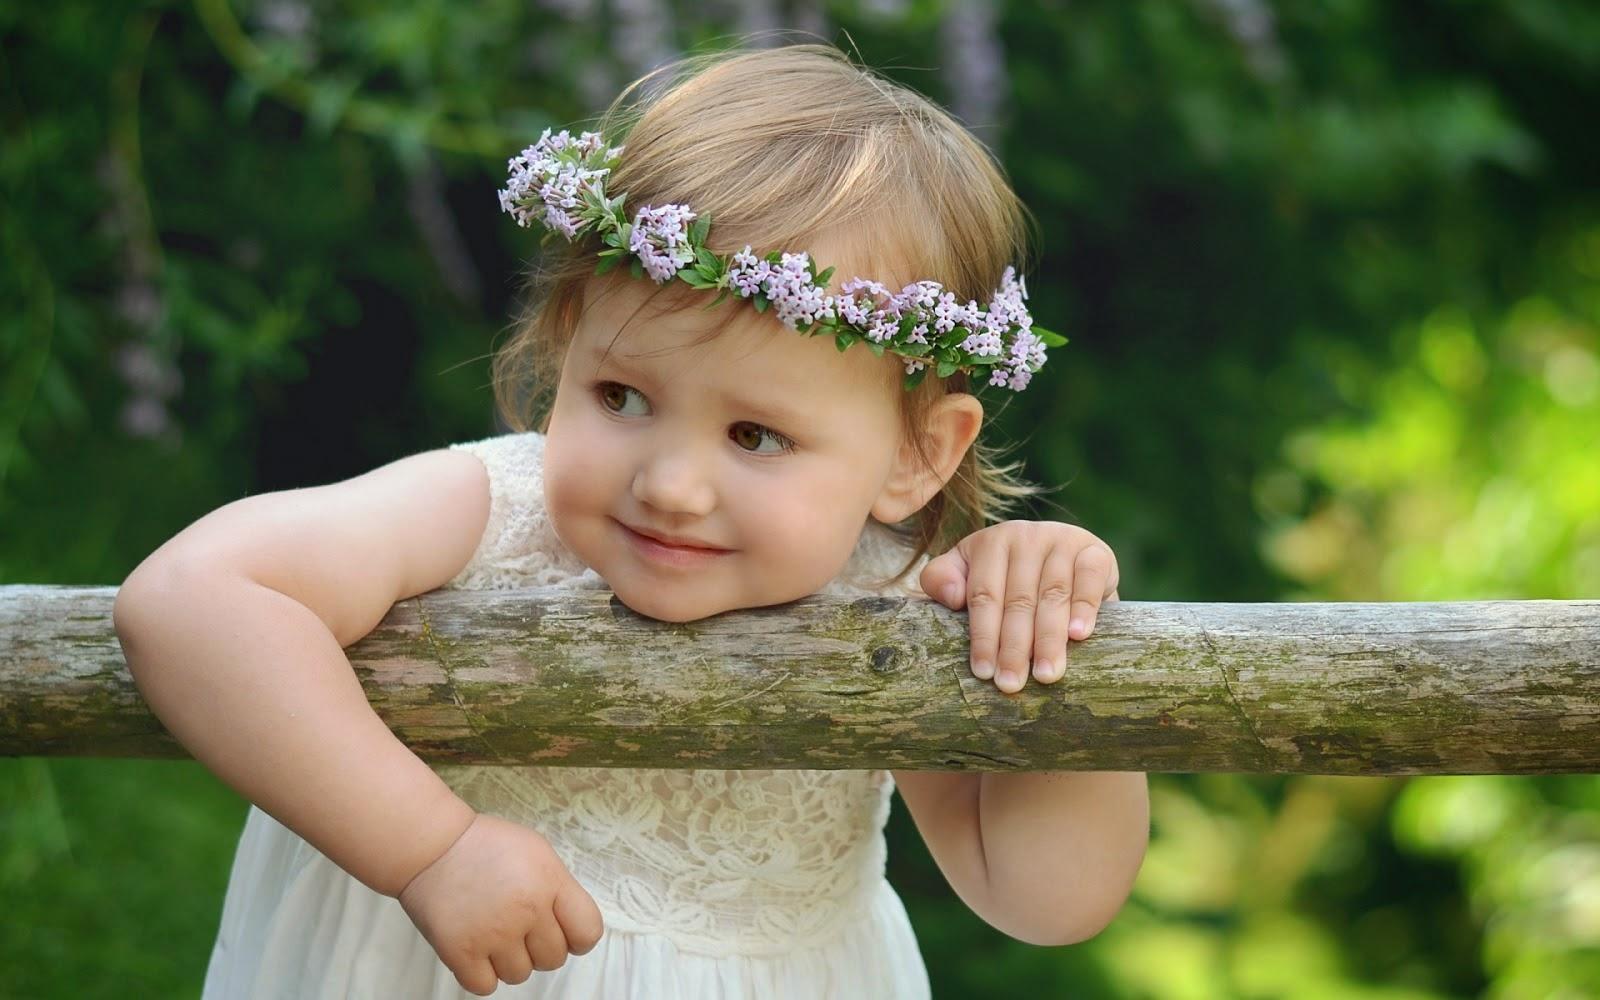 very beautiful and cute kids - princess - cute kids